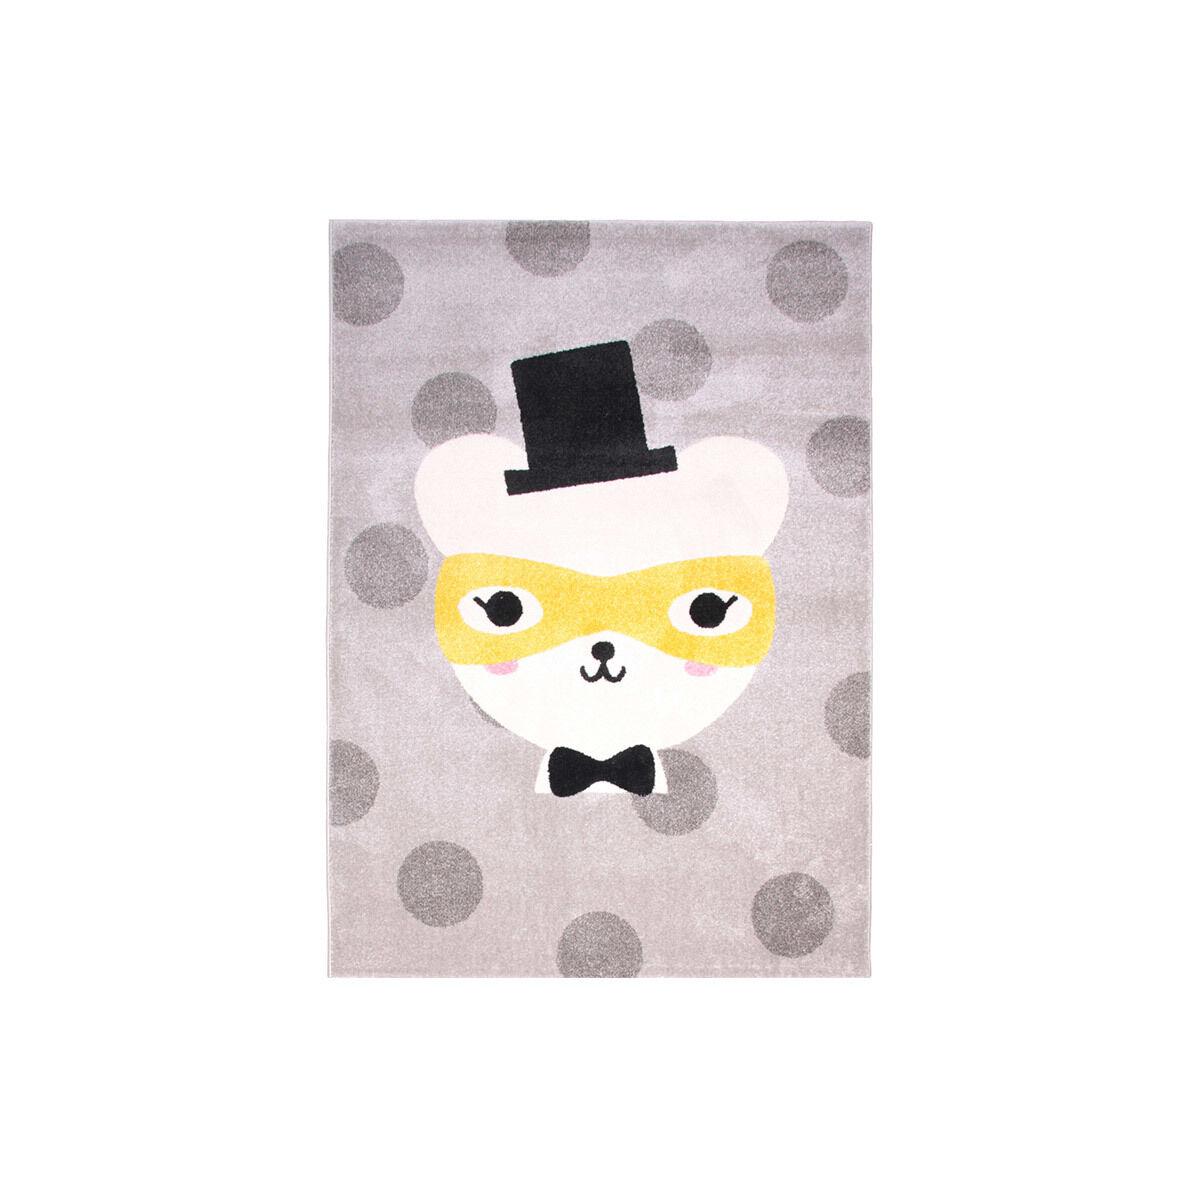 Miliboo Tapis enfant avec imprimé animal 120x170 cm SWEET